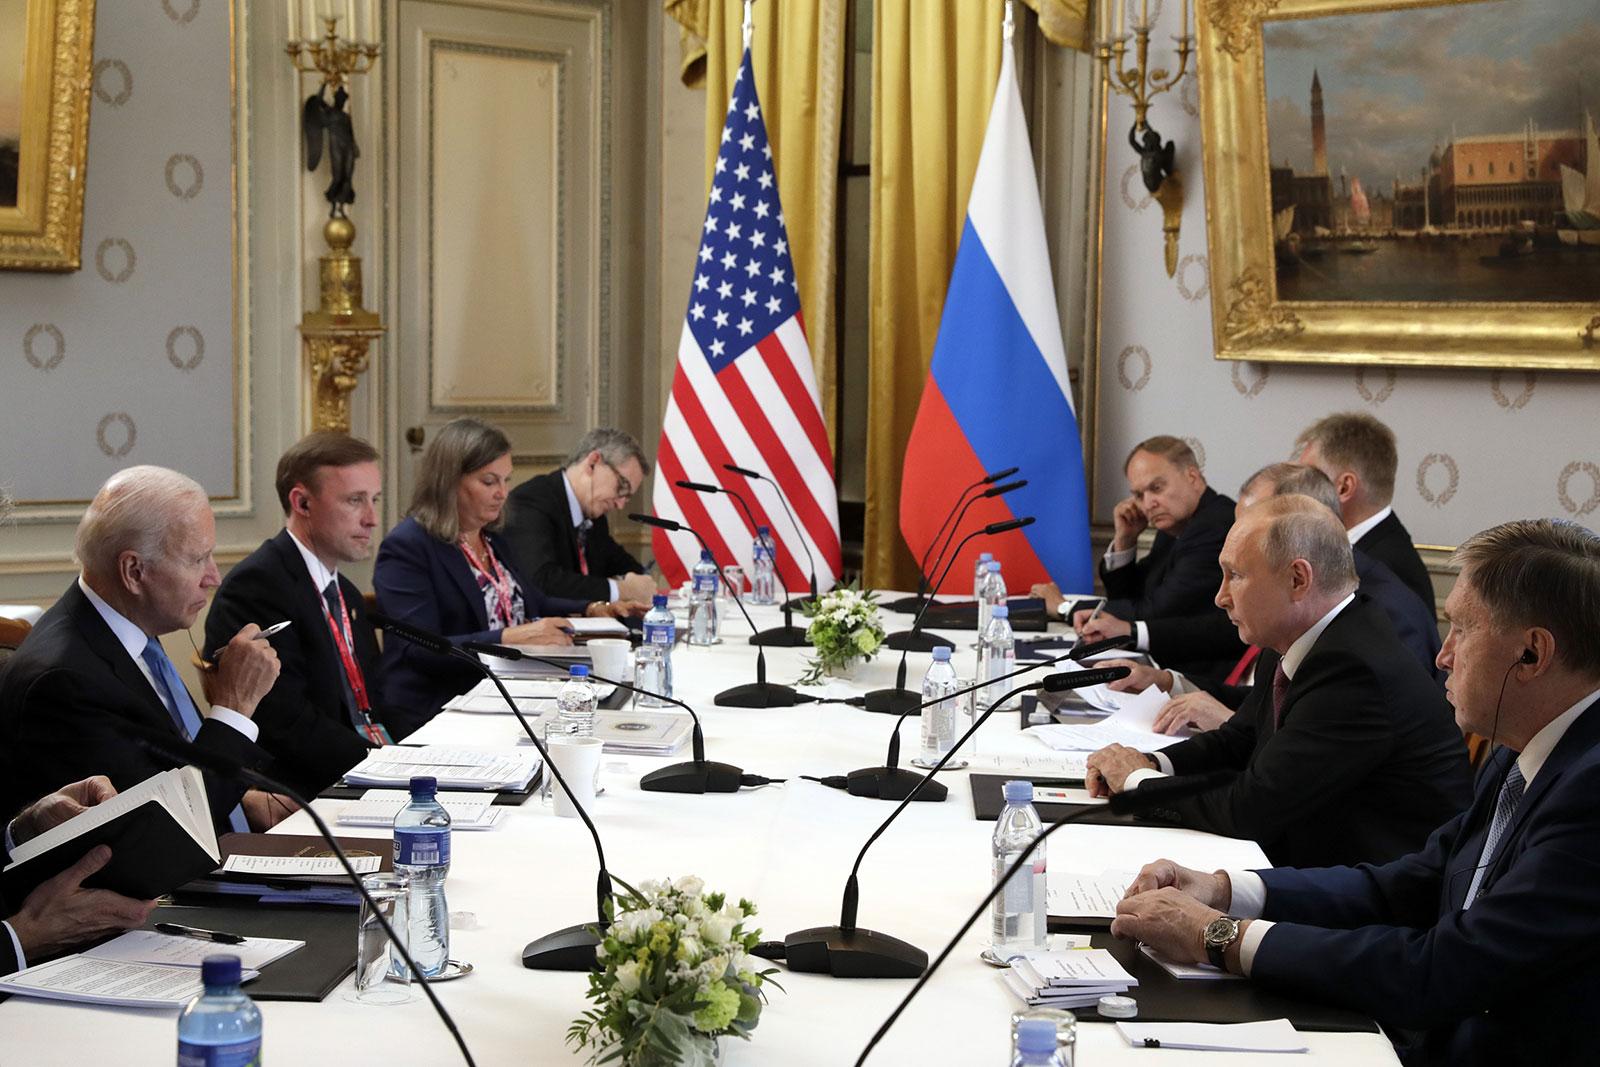 Mikhail Metzel/TASS/Getty Images